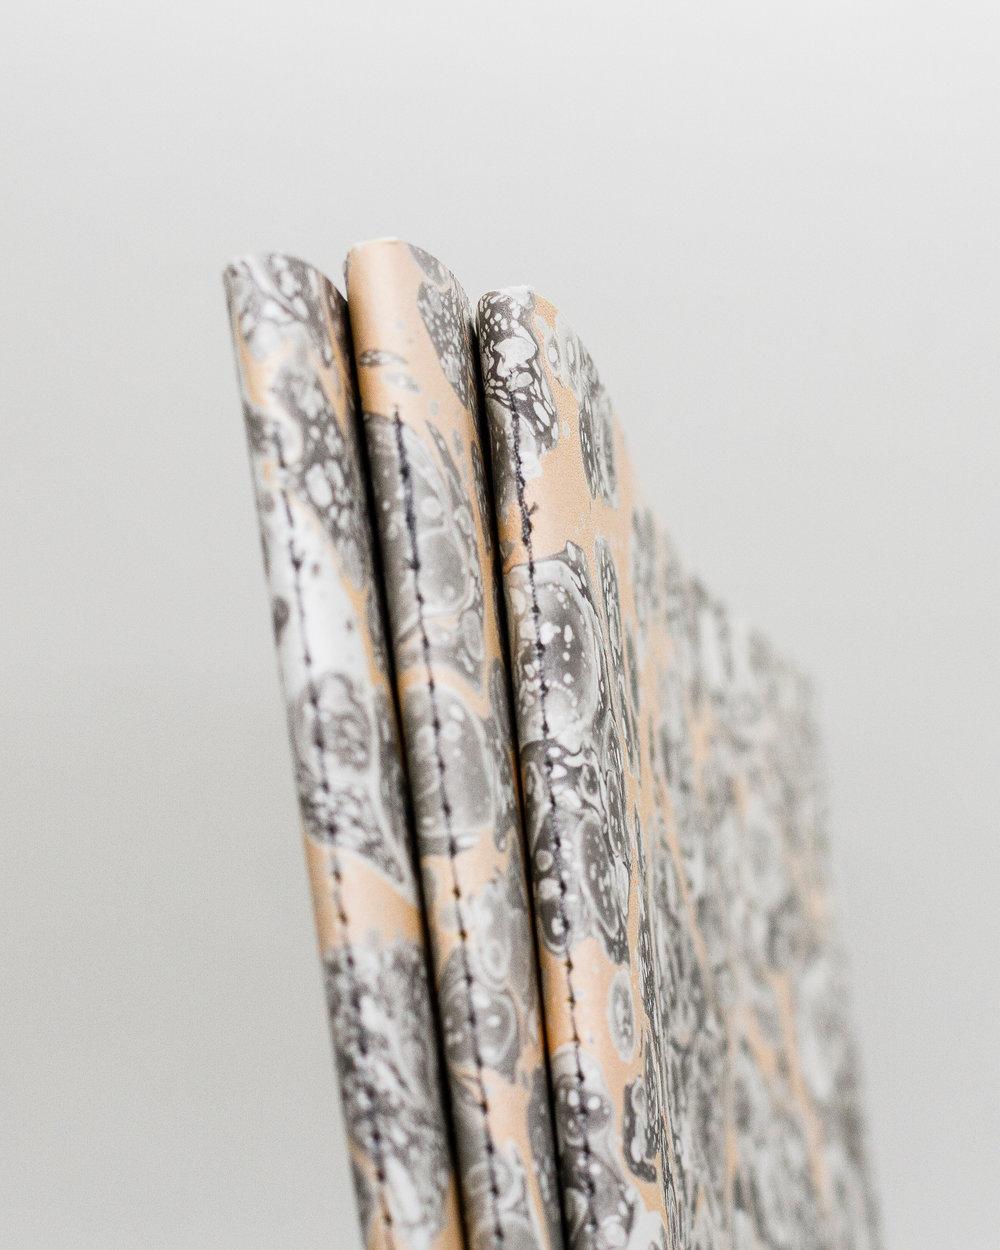 cahier granit 4.jpeg